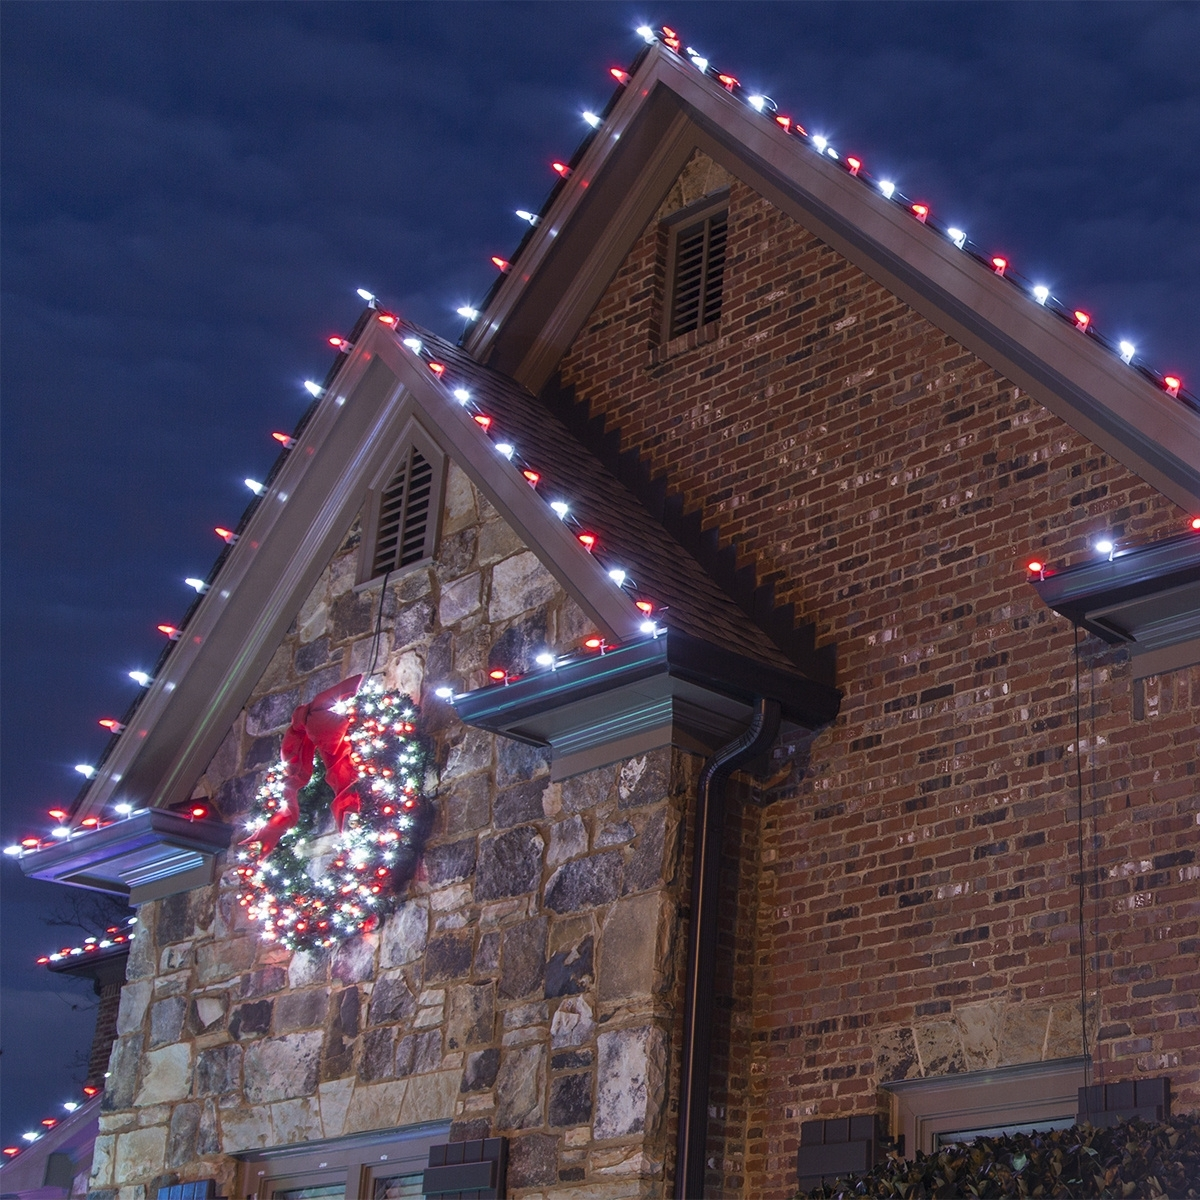 How To Hang Outdoor Christmas Lights.15 Best Collection Of Hanging Outdoor Christmas Lights In Roof